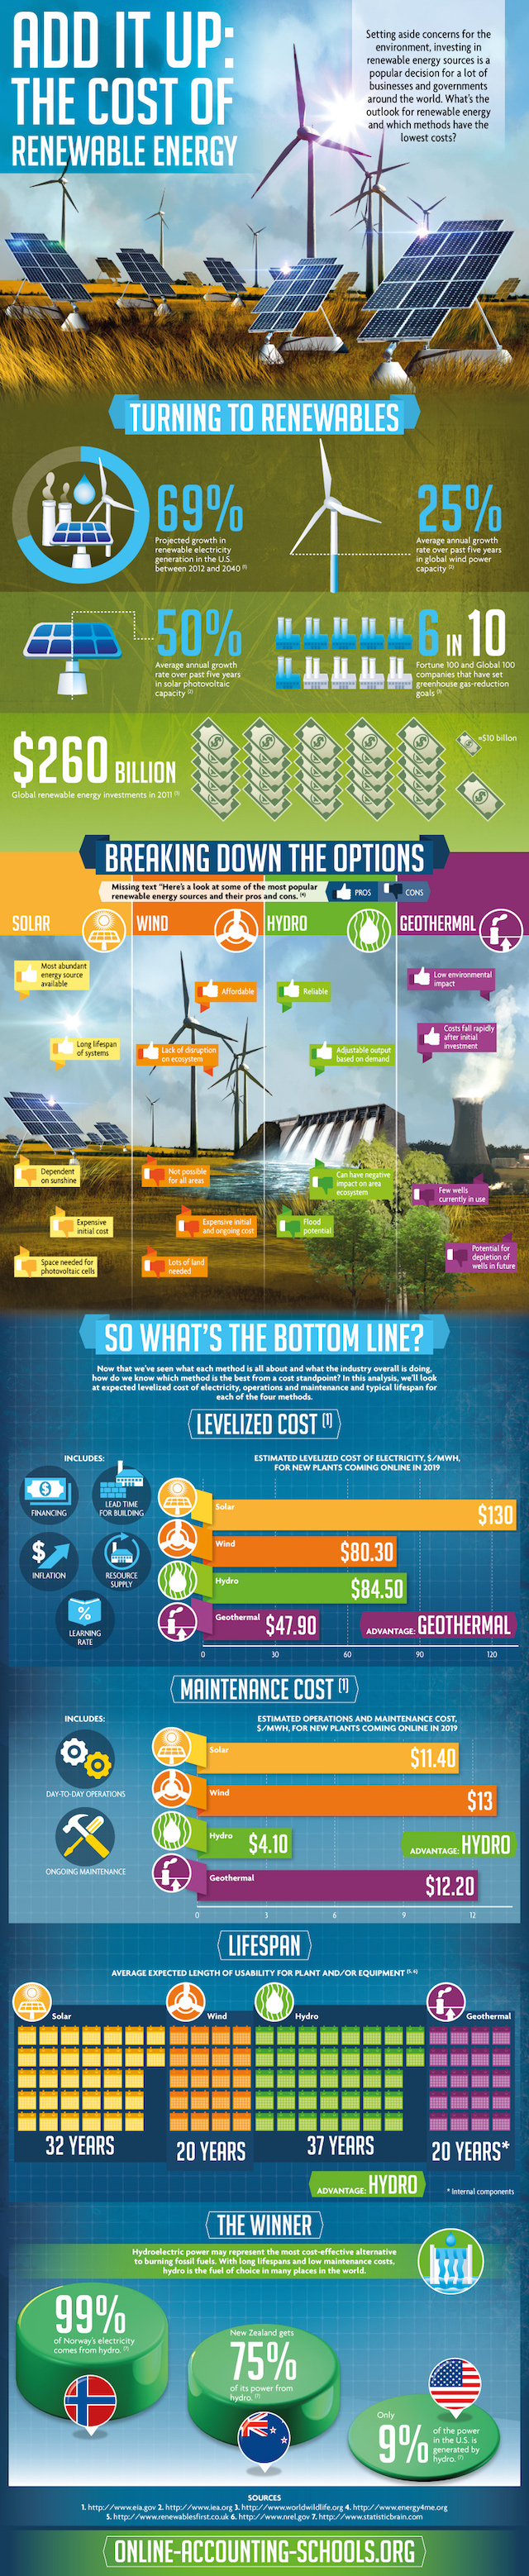 The Cost of Renewable Energy